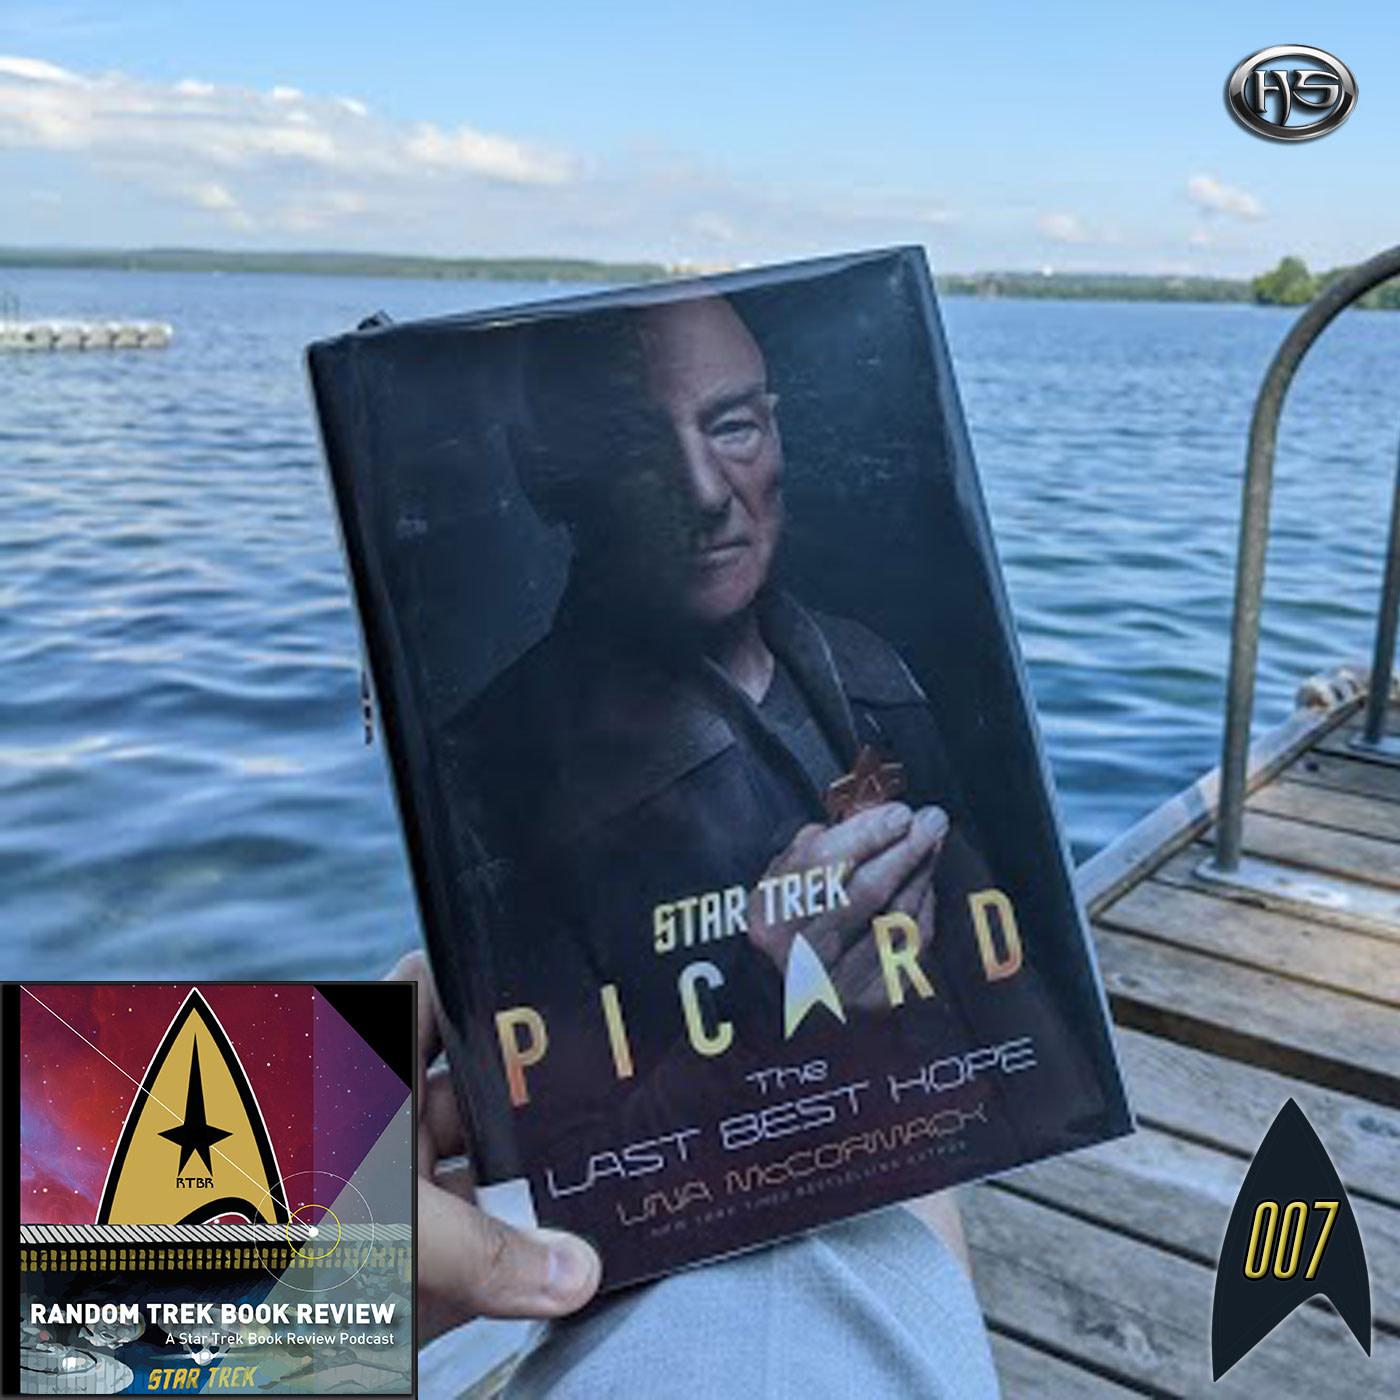 Random Trek Book Review Episode 7